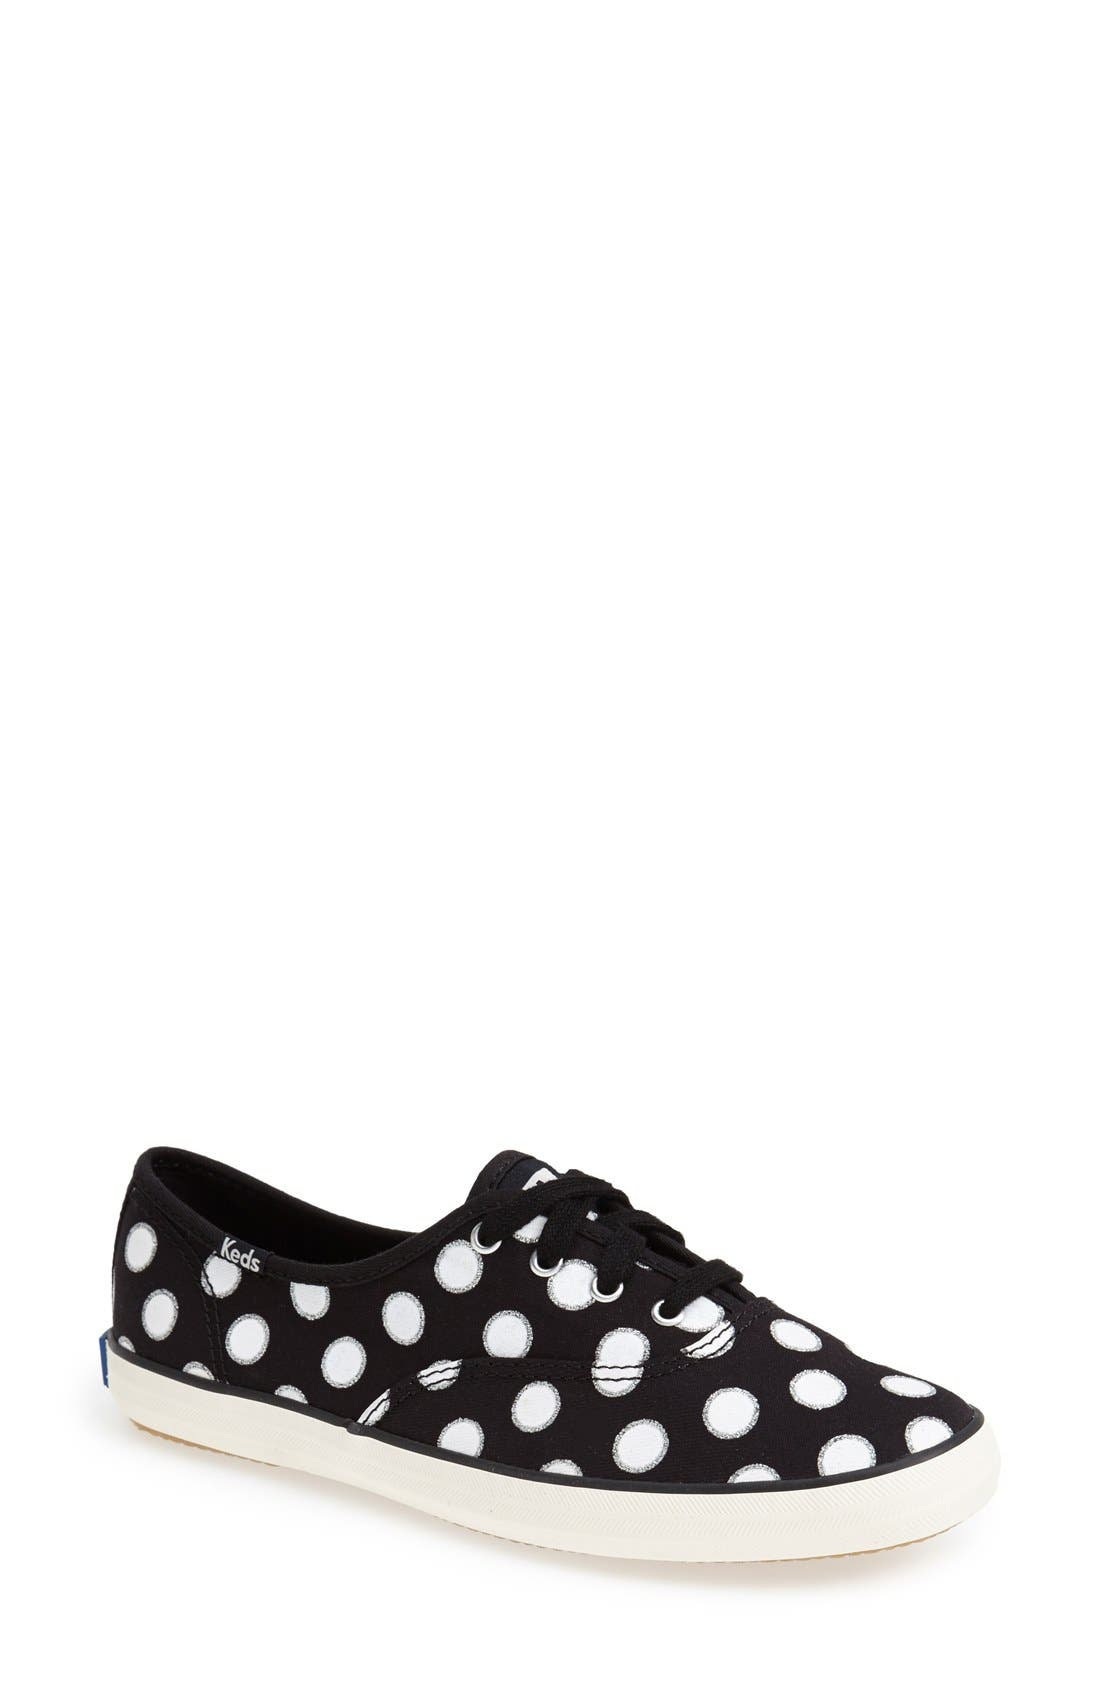 Alternate Image 1 Selected - Keds® 'Champion - Glitter Dot' Canvas Sneaker (Women) (Regular Retail Price: $49.95)